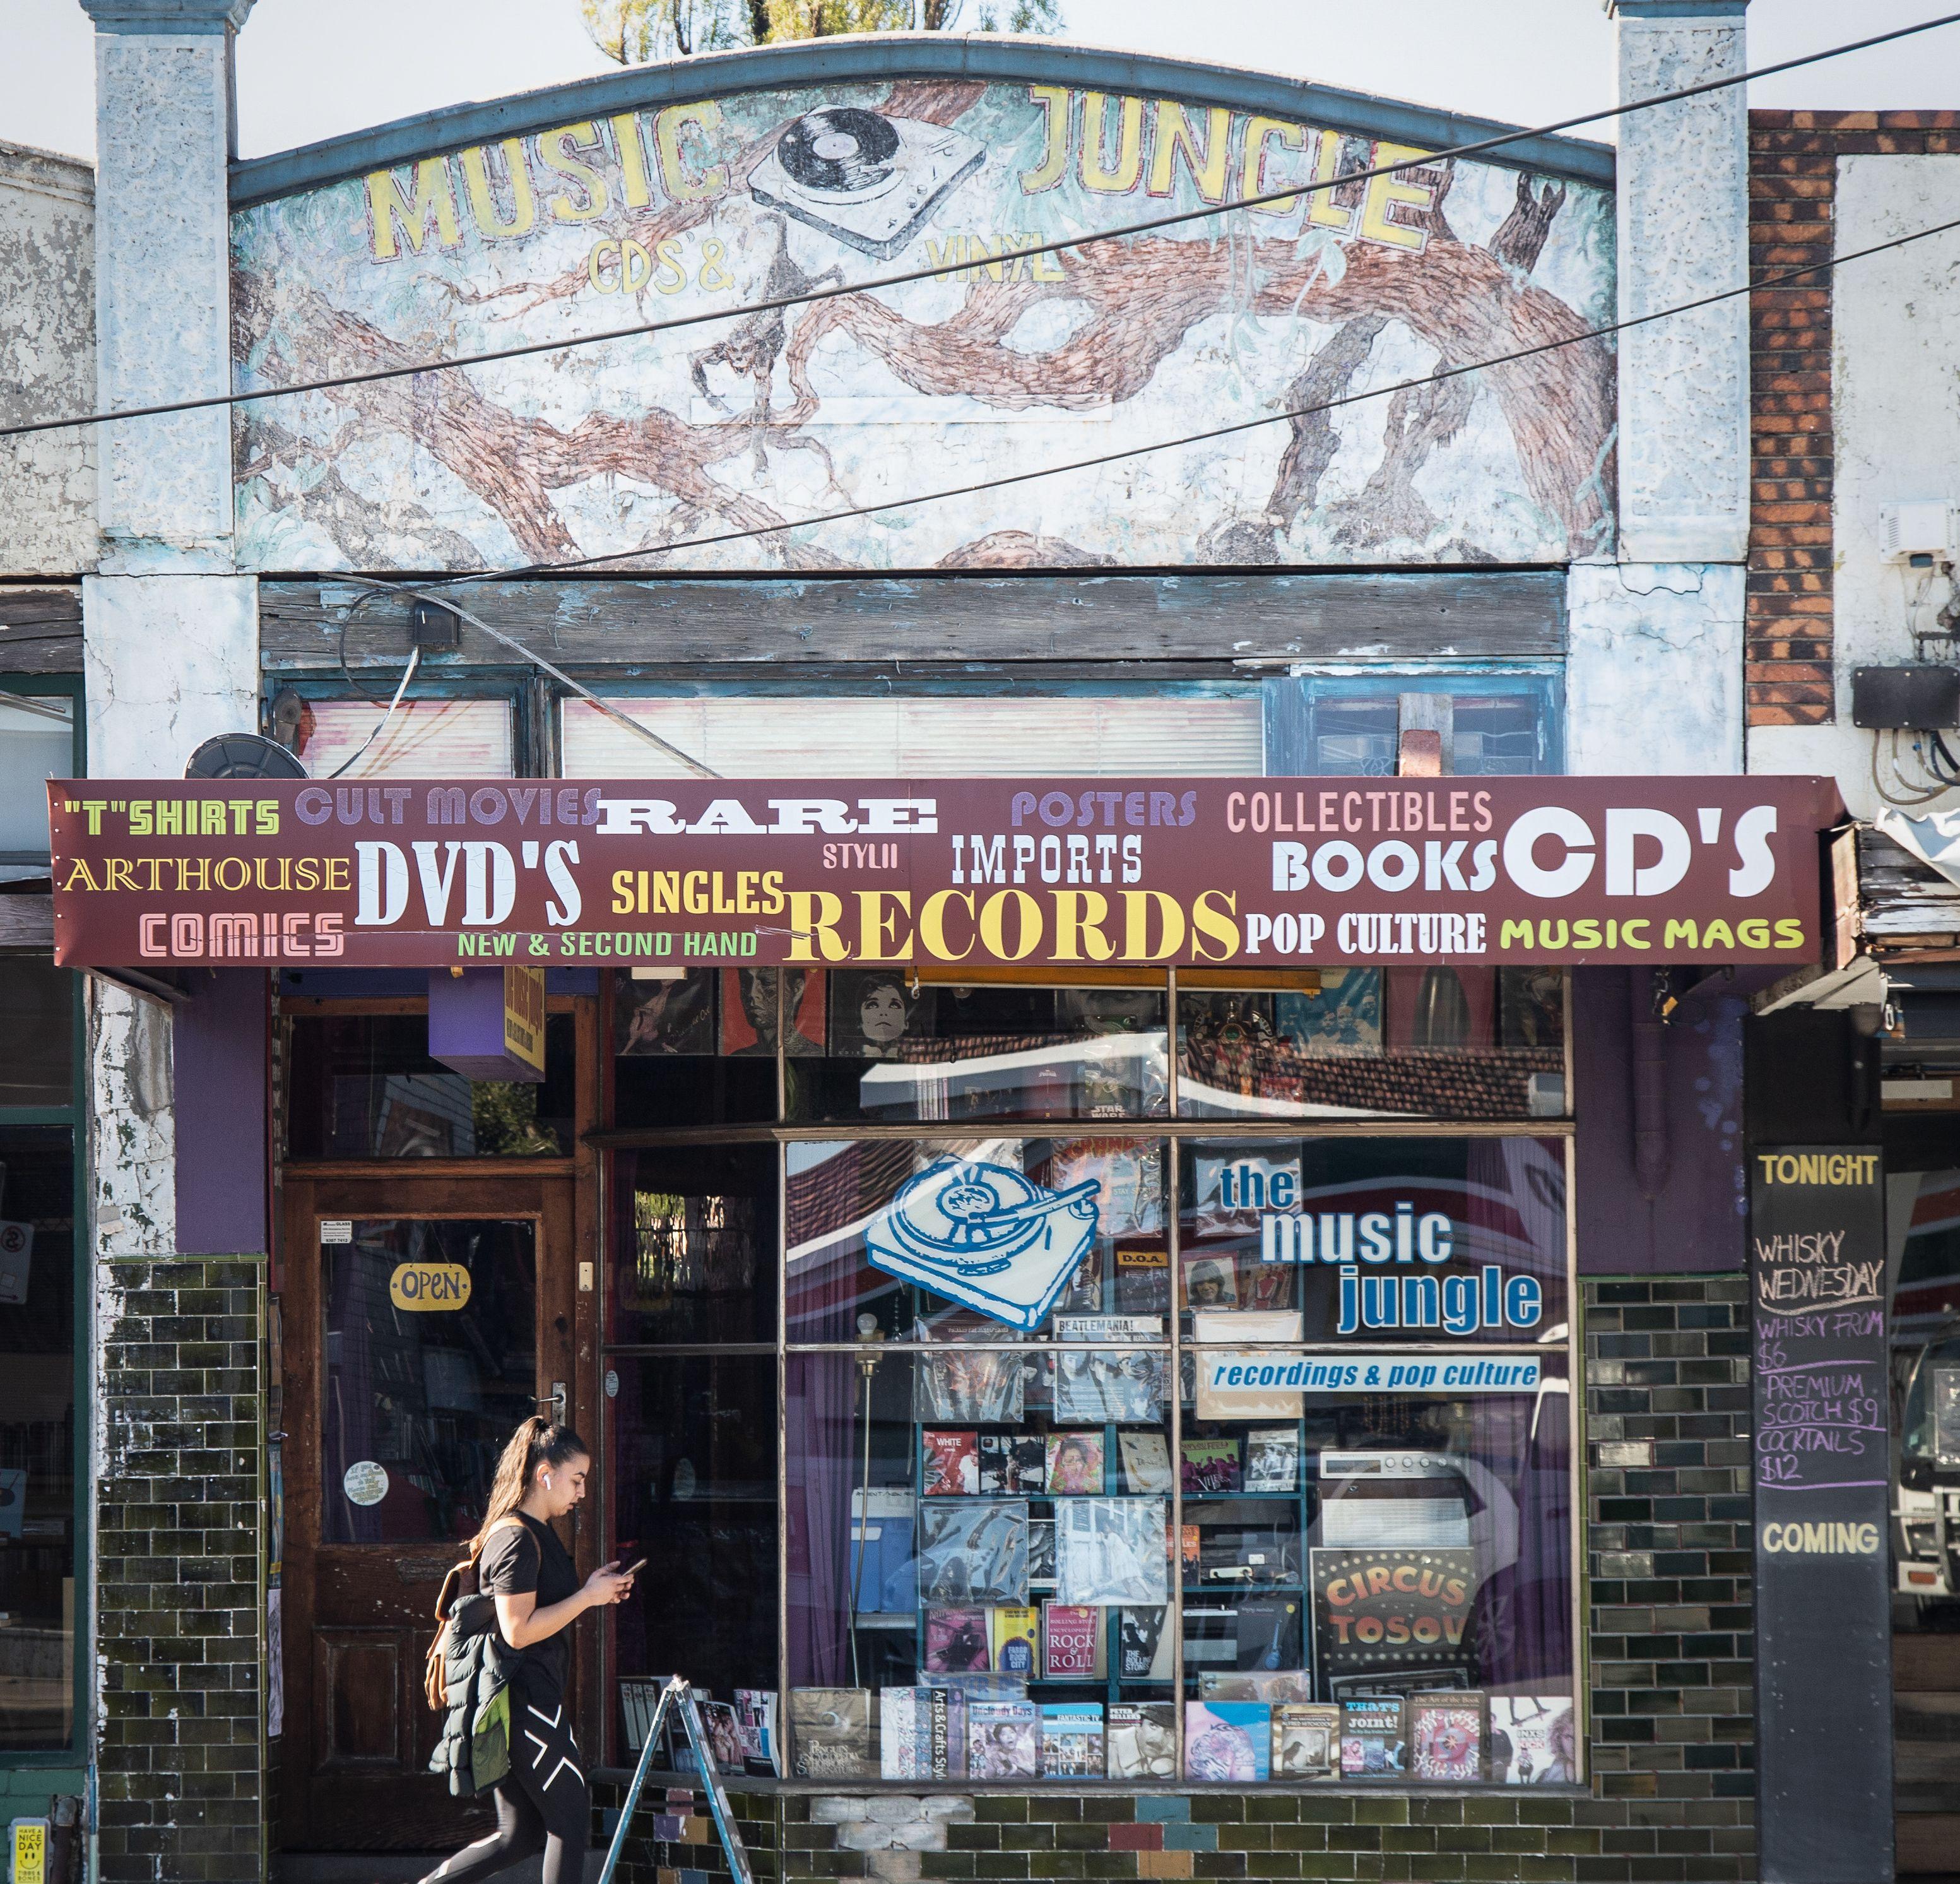 Neighbourhood: Thornbury